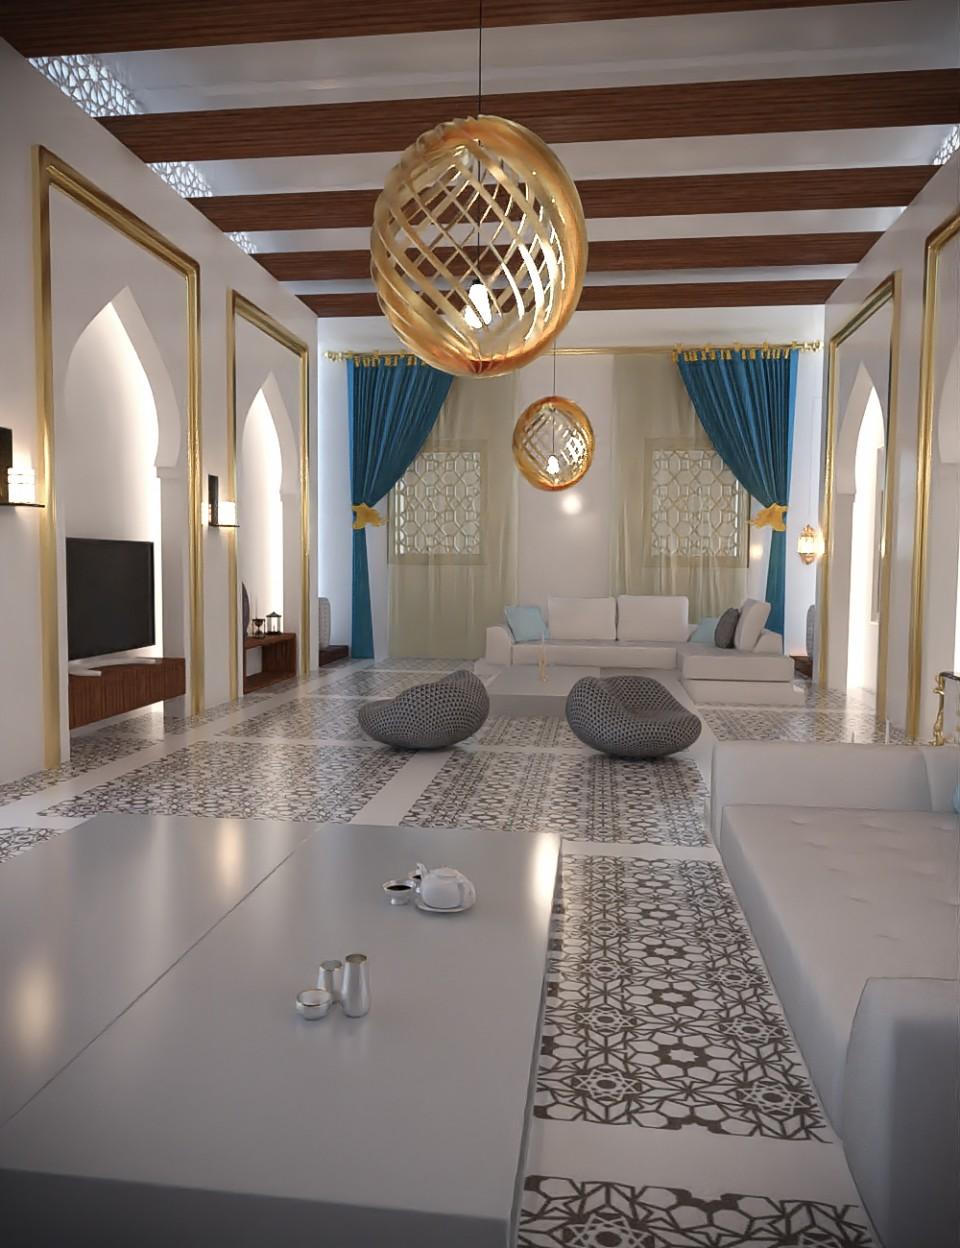 Arabic Anteroom_DAZ3D下载站